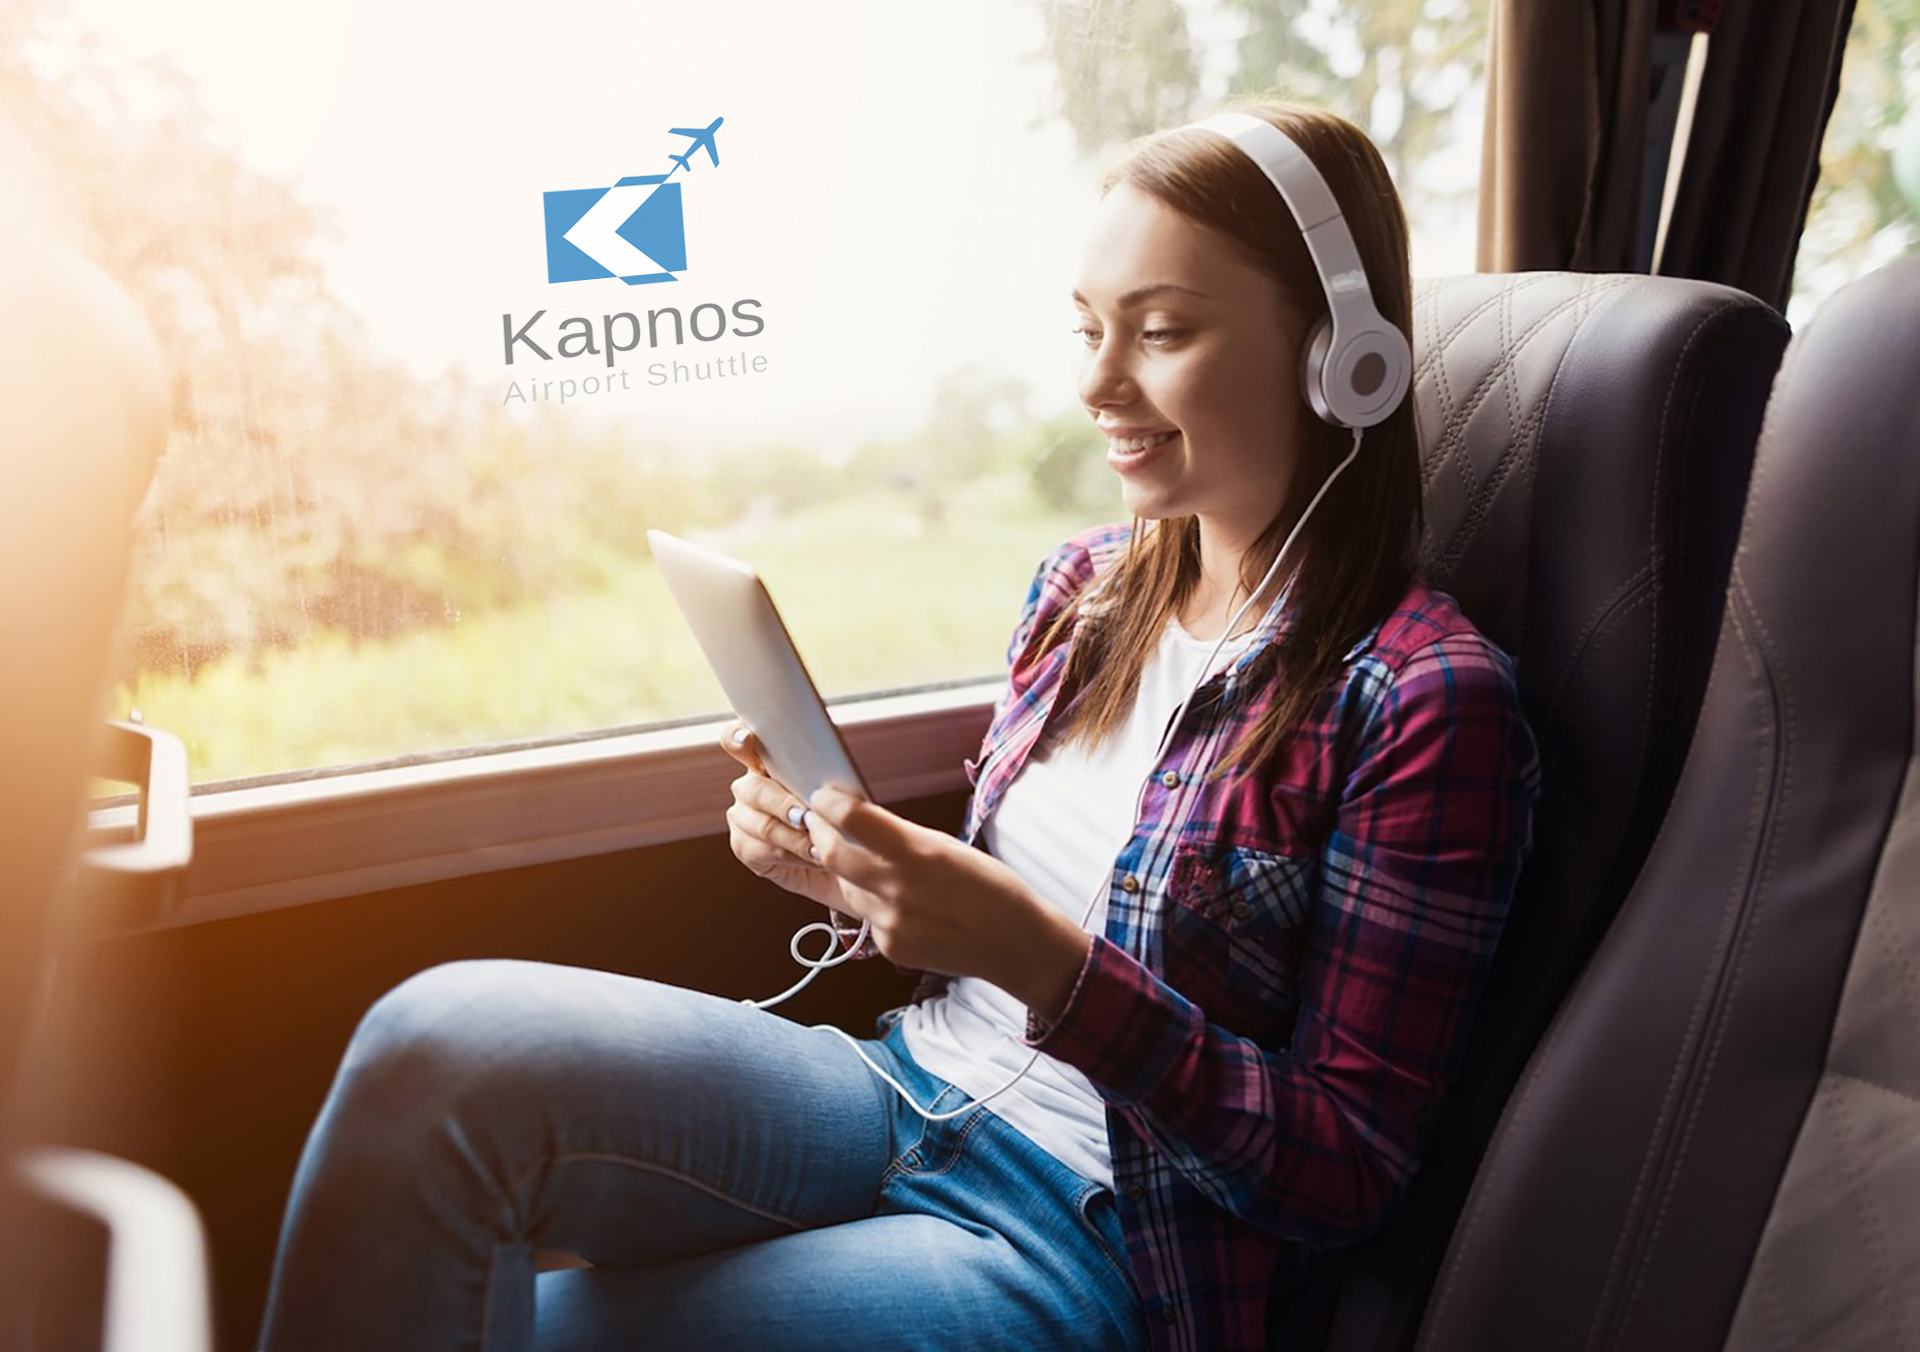 KAPNOS AIRPORT SHUTTLE Web app, Website